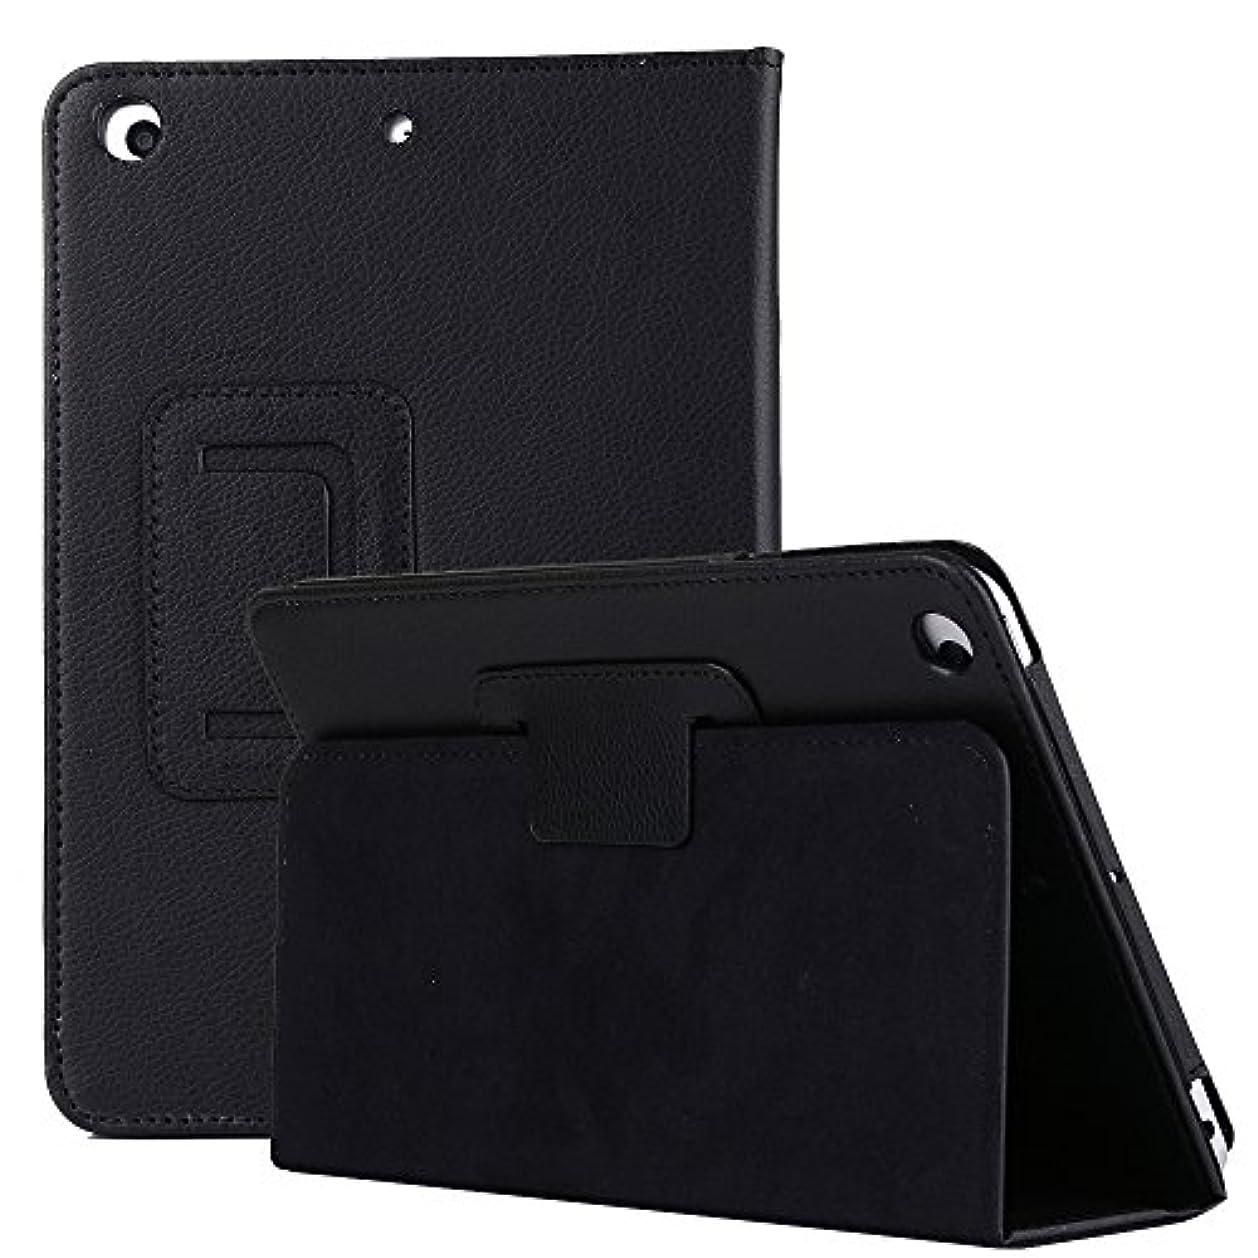 Galaxy tab A 8.0薄型携帯ケース2019、TechCodeライト級スマートブックケース、多角度マイクロファイバーの裏地角度保護カバーを調べて、サムスンGalaxy tab A 8.0インチ2019 SM-T...